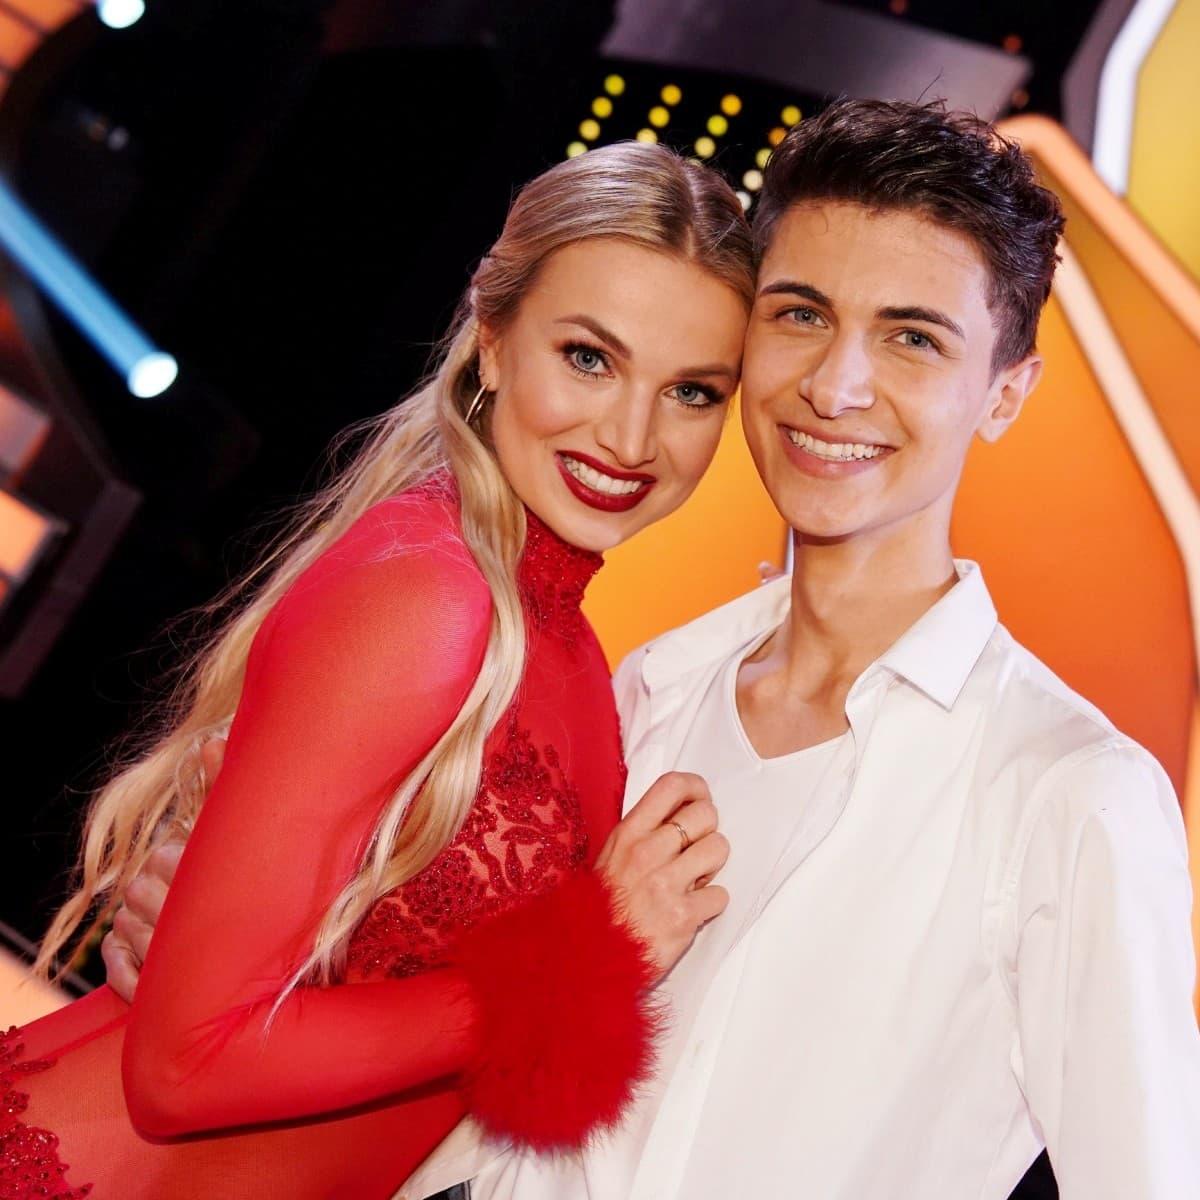 Katja Kalugina - Lukas Rieger Tanzpaar bei Let's dance 2019